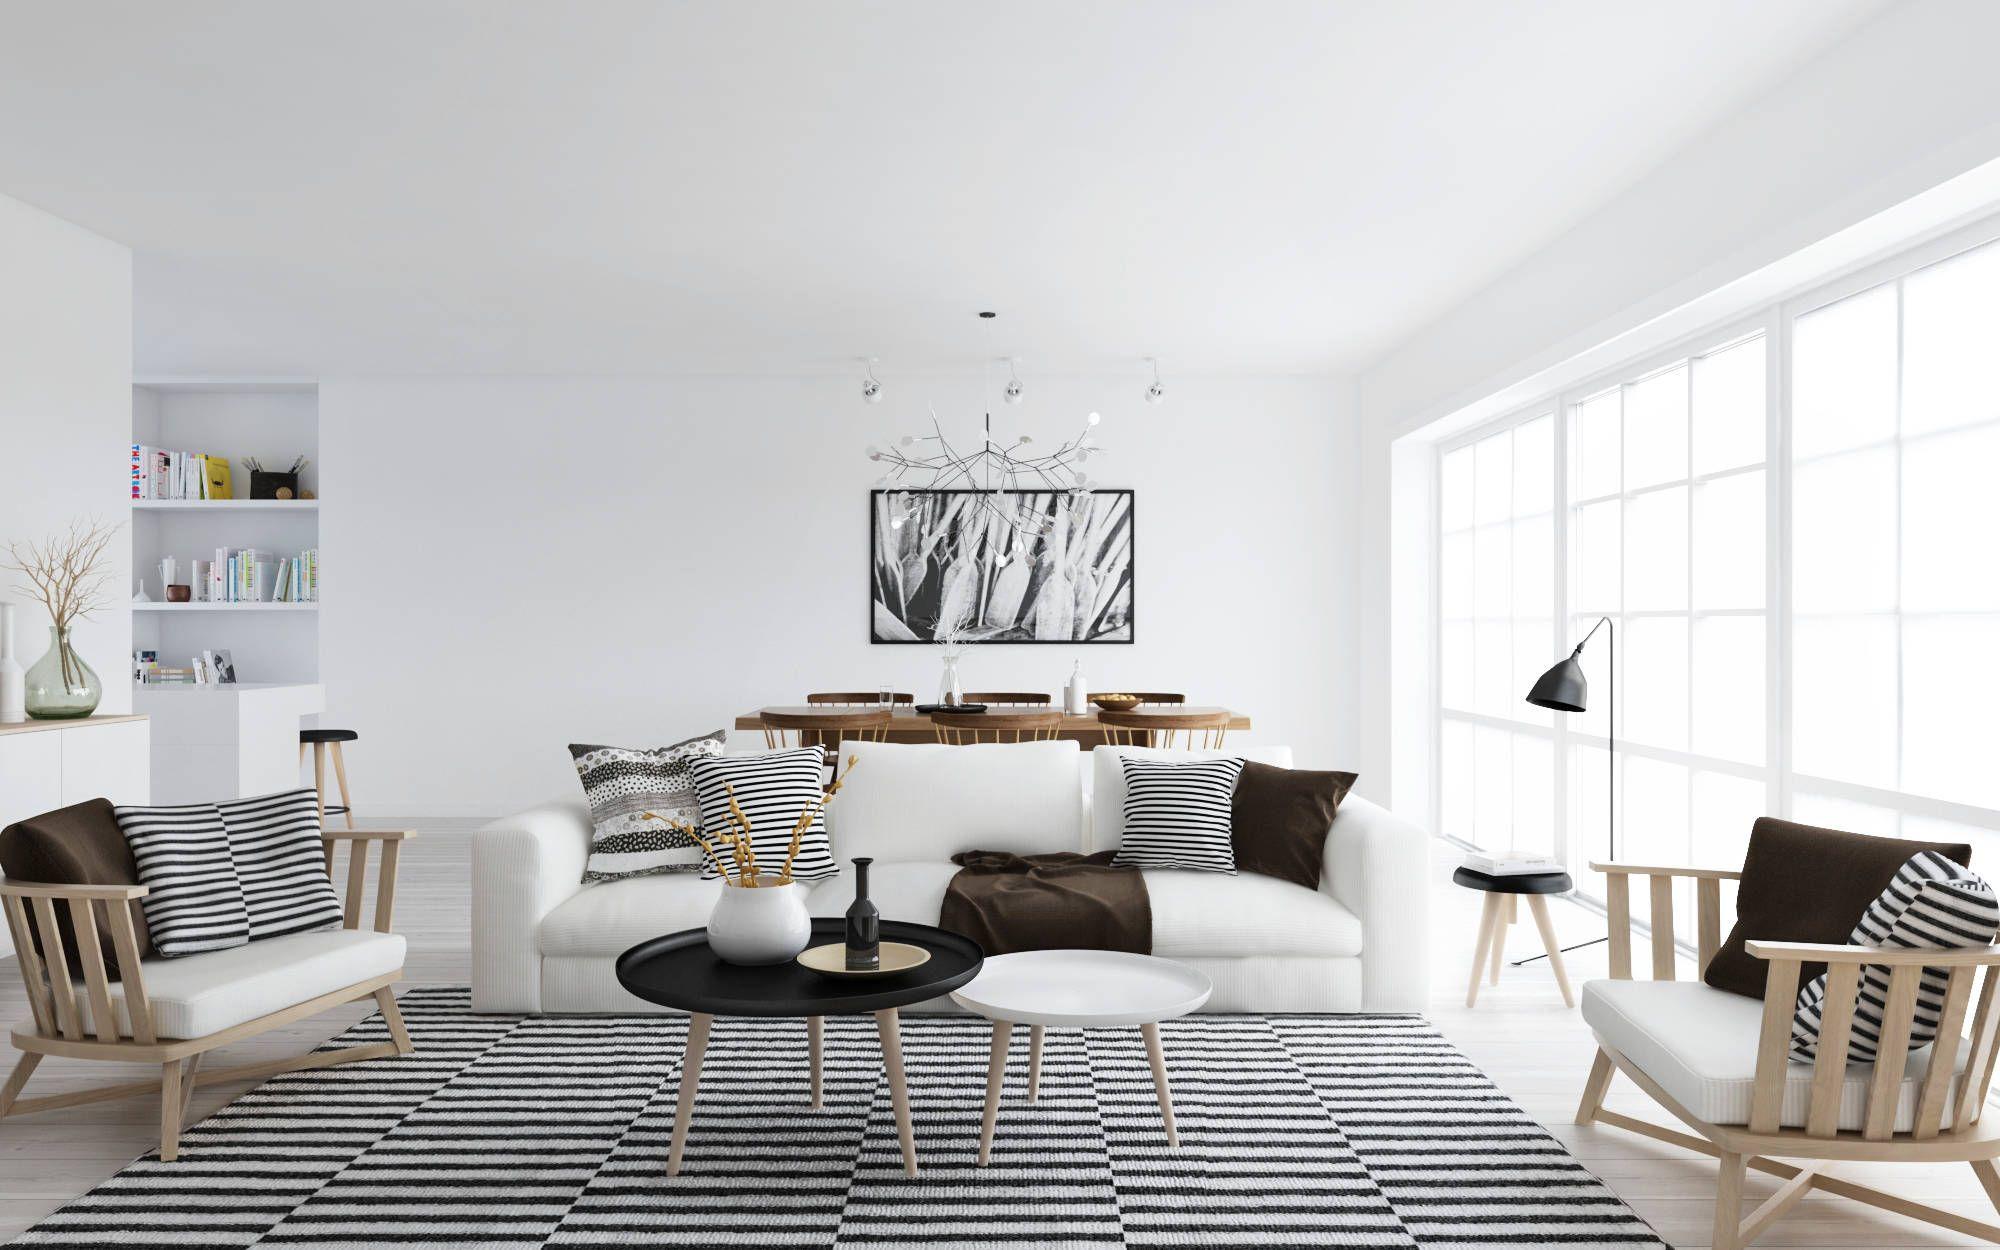 scandinavian interior design - 1000+ images about Scandinavian interior on Pinterest ...